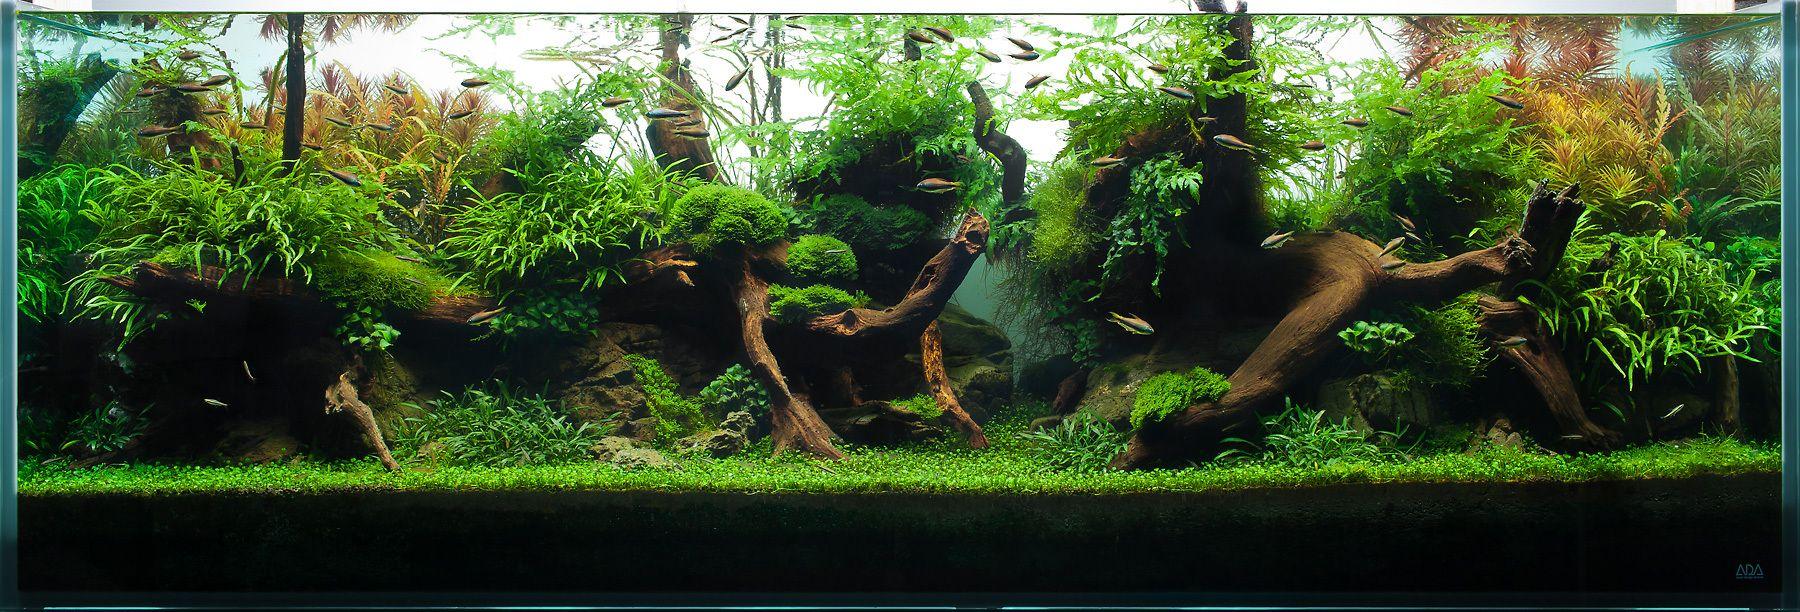 Fish tank real plants - Aquarium Design Group An Aquascape Of Highlight And Shadow